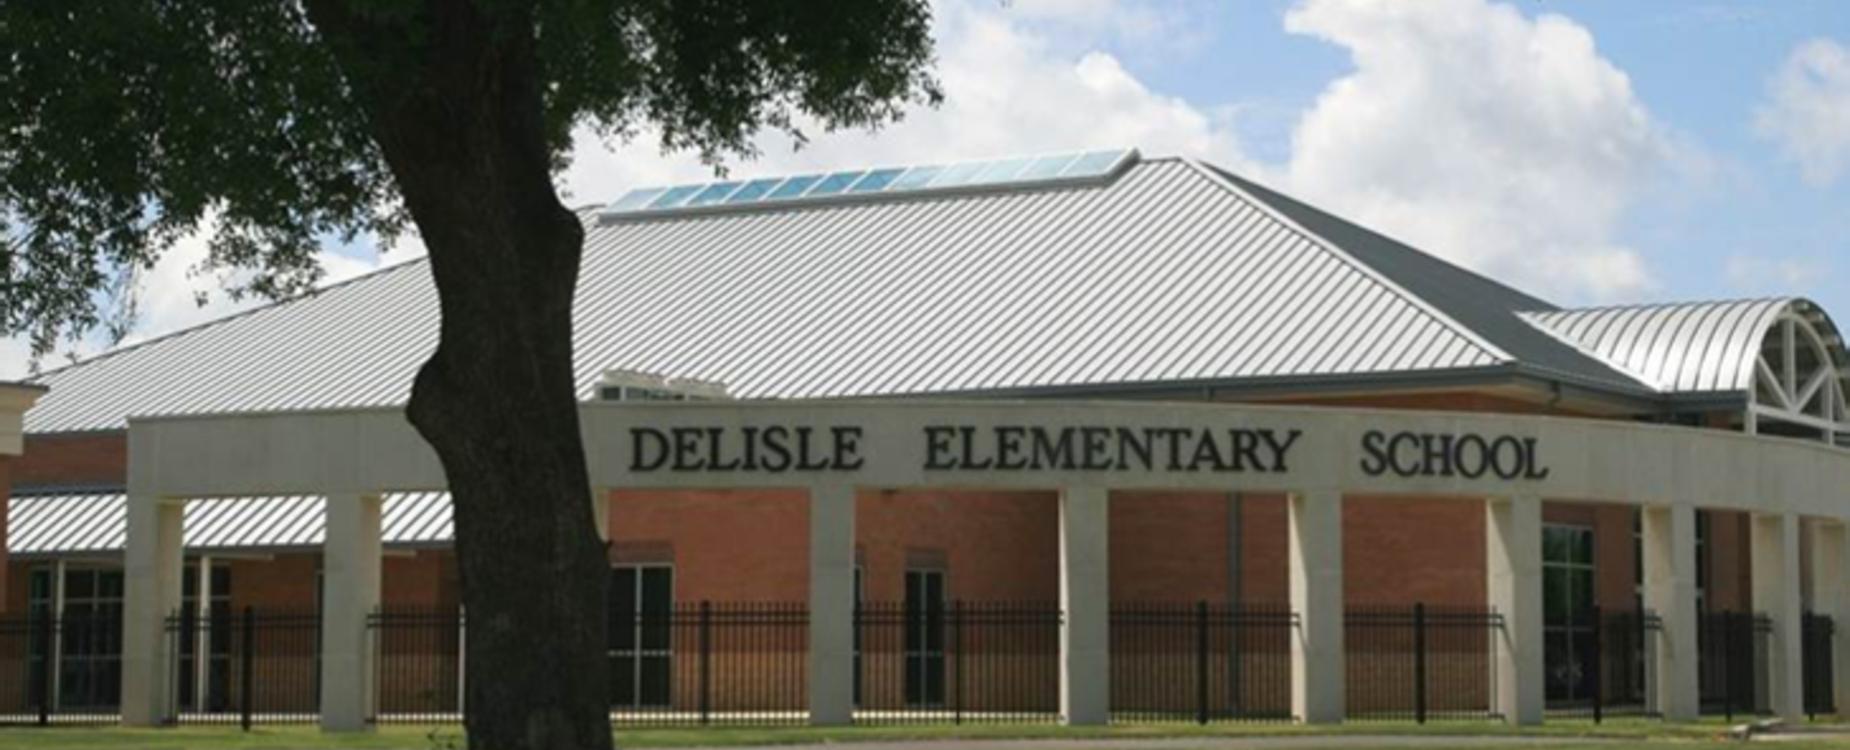 DeLisle Elementary School